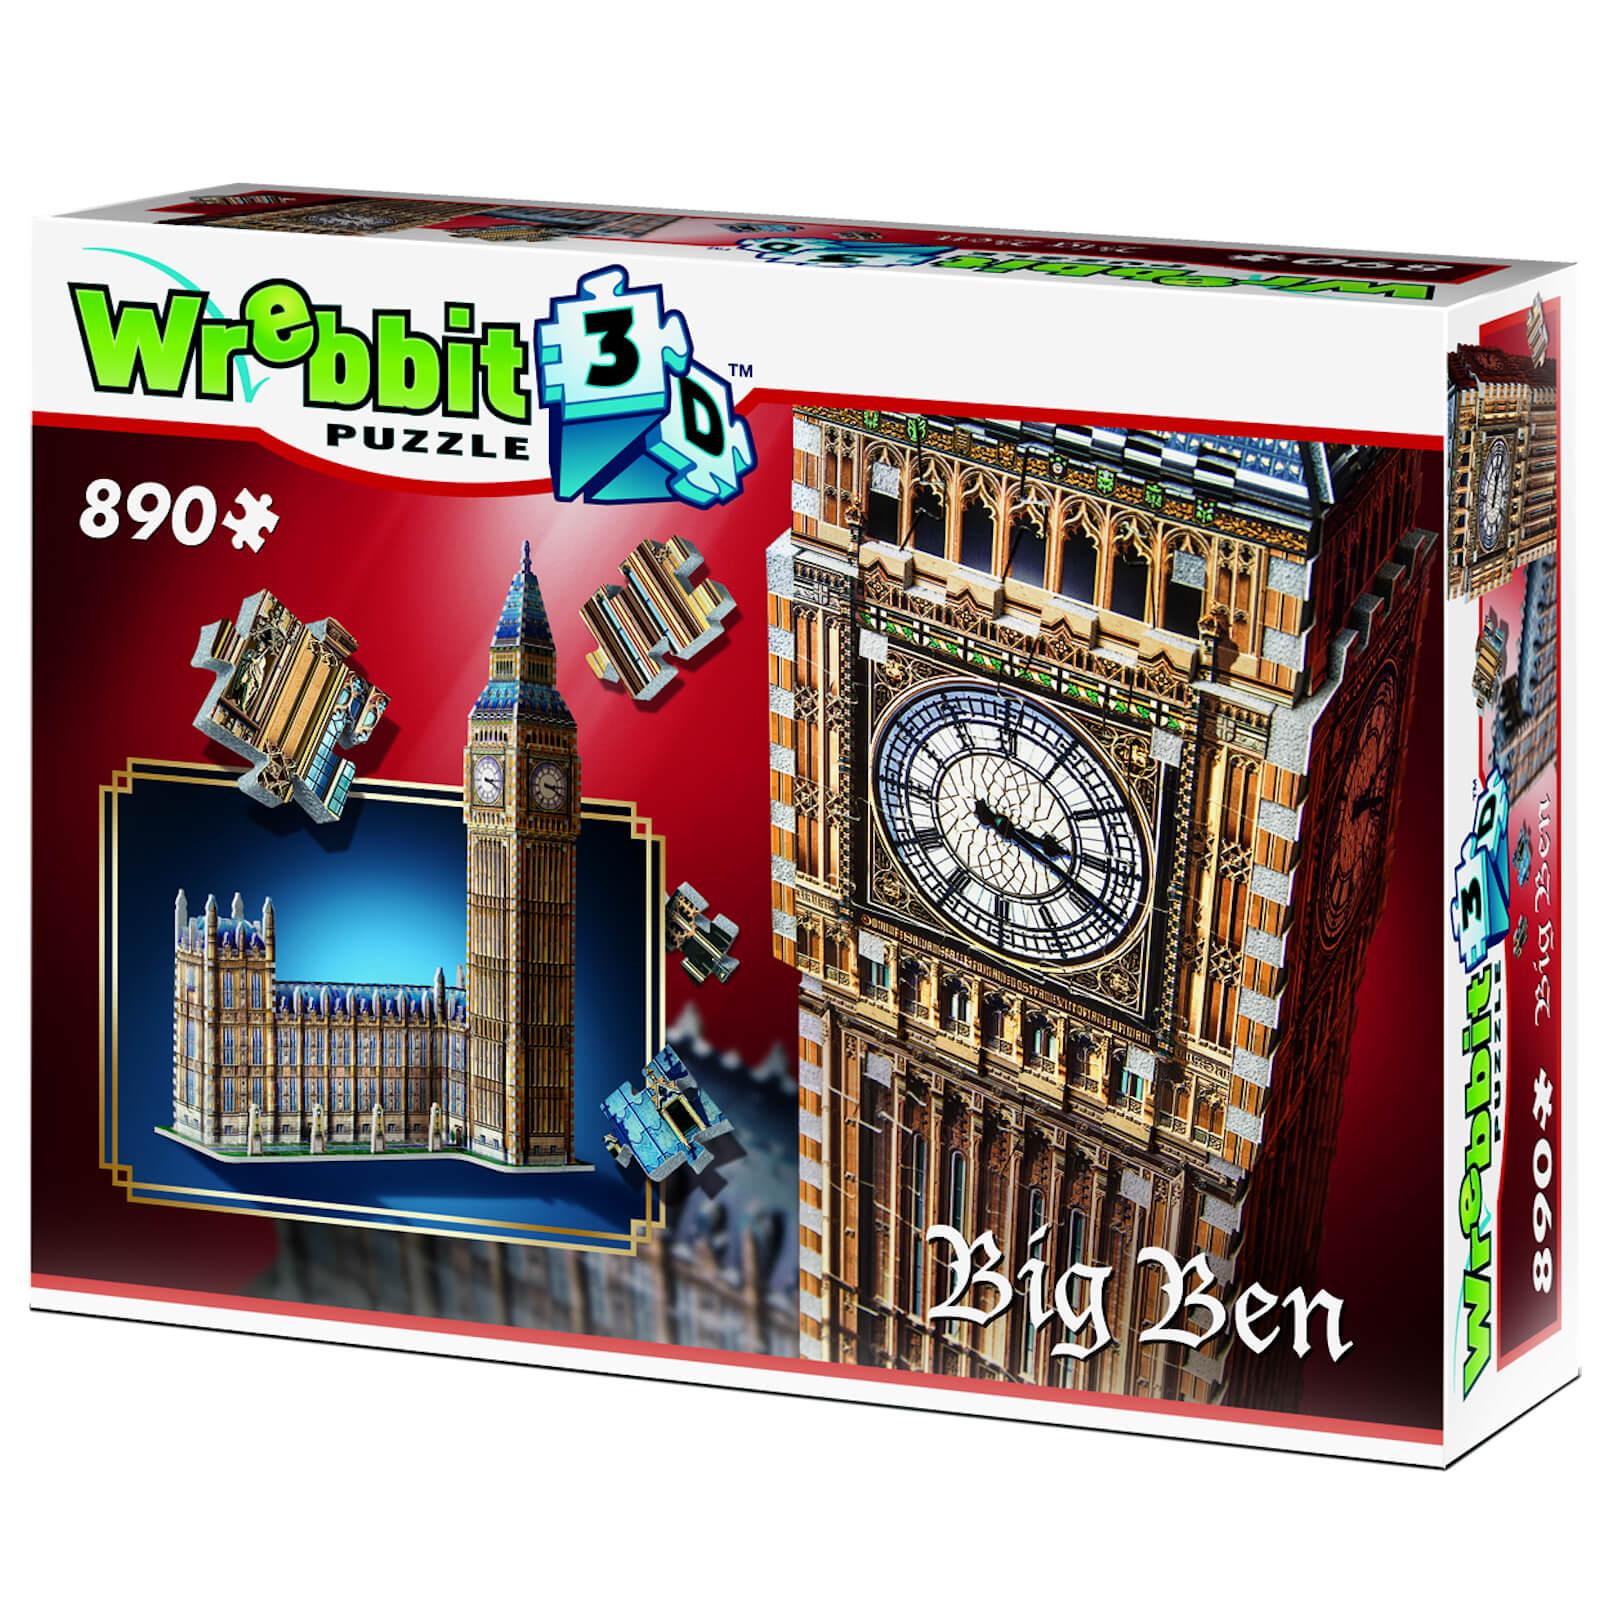 Image of Wrebbit 3D Big Ben Jigsaw Puzzle - 890 Pieces